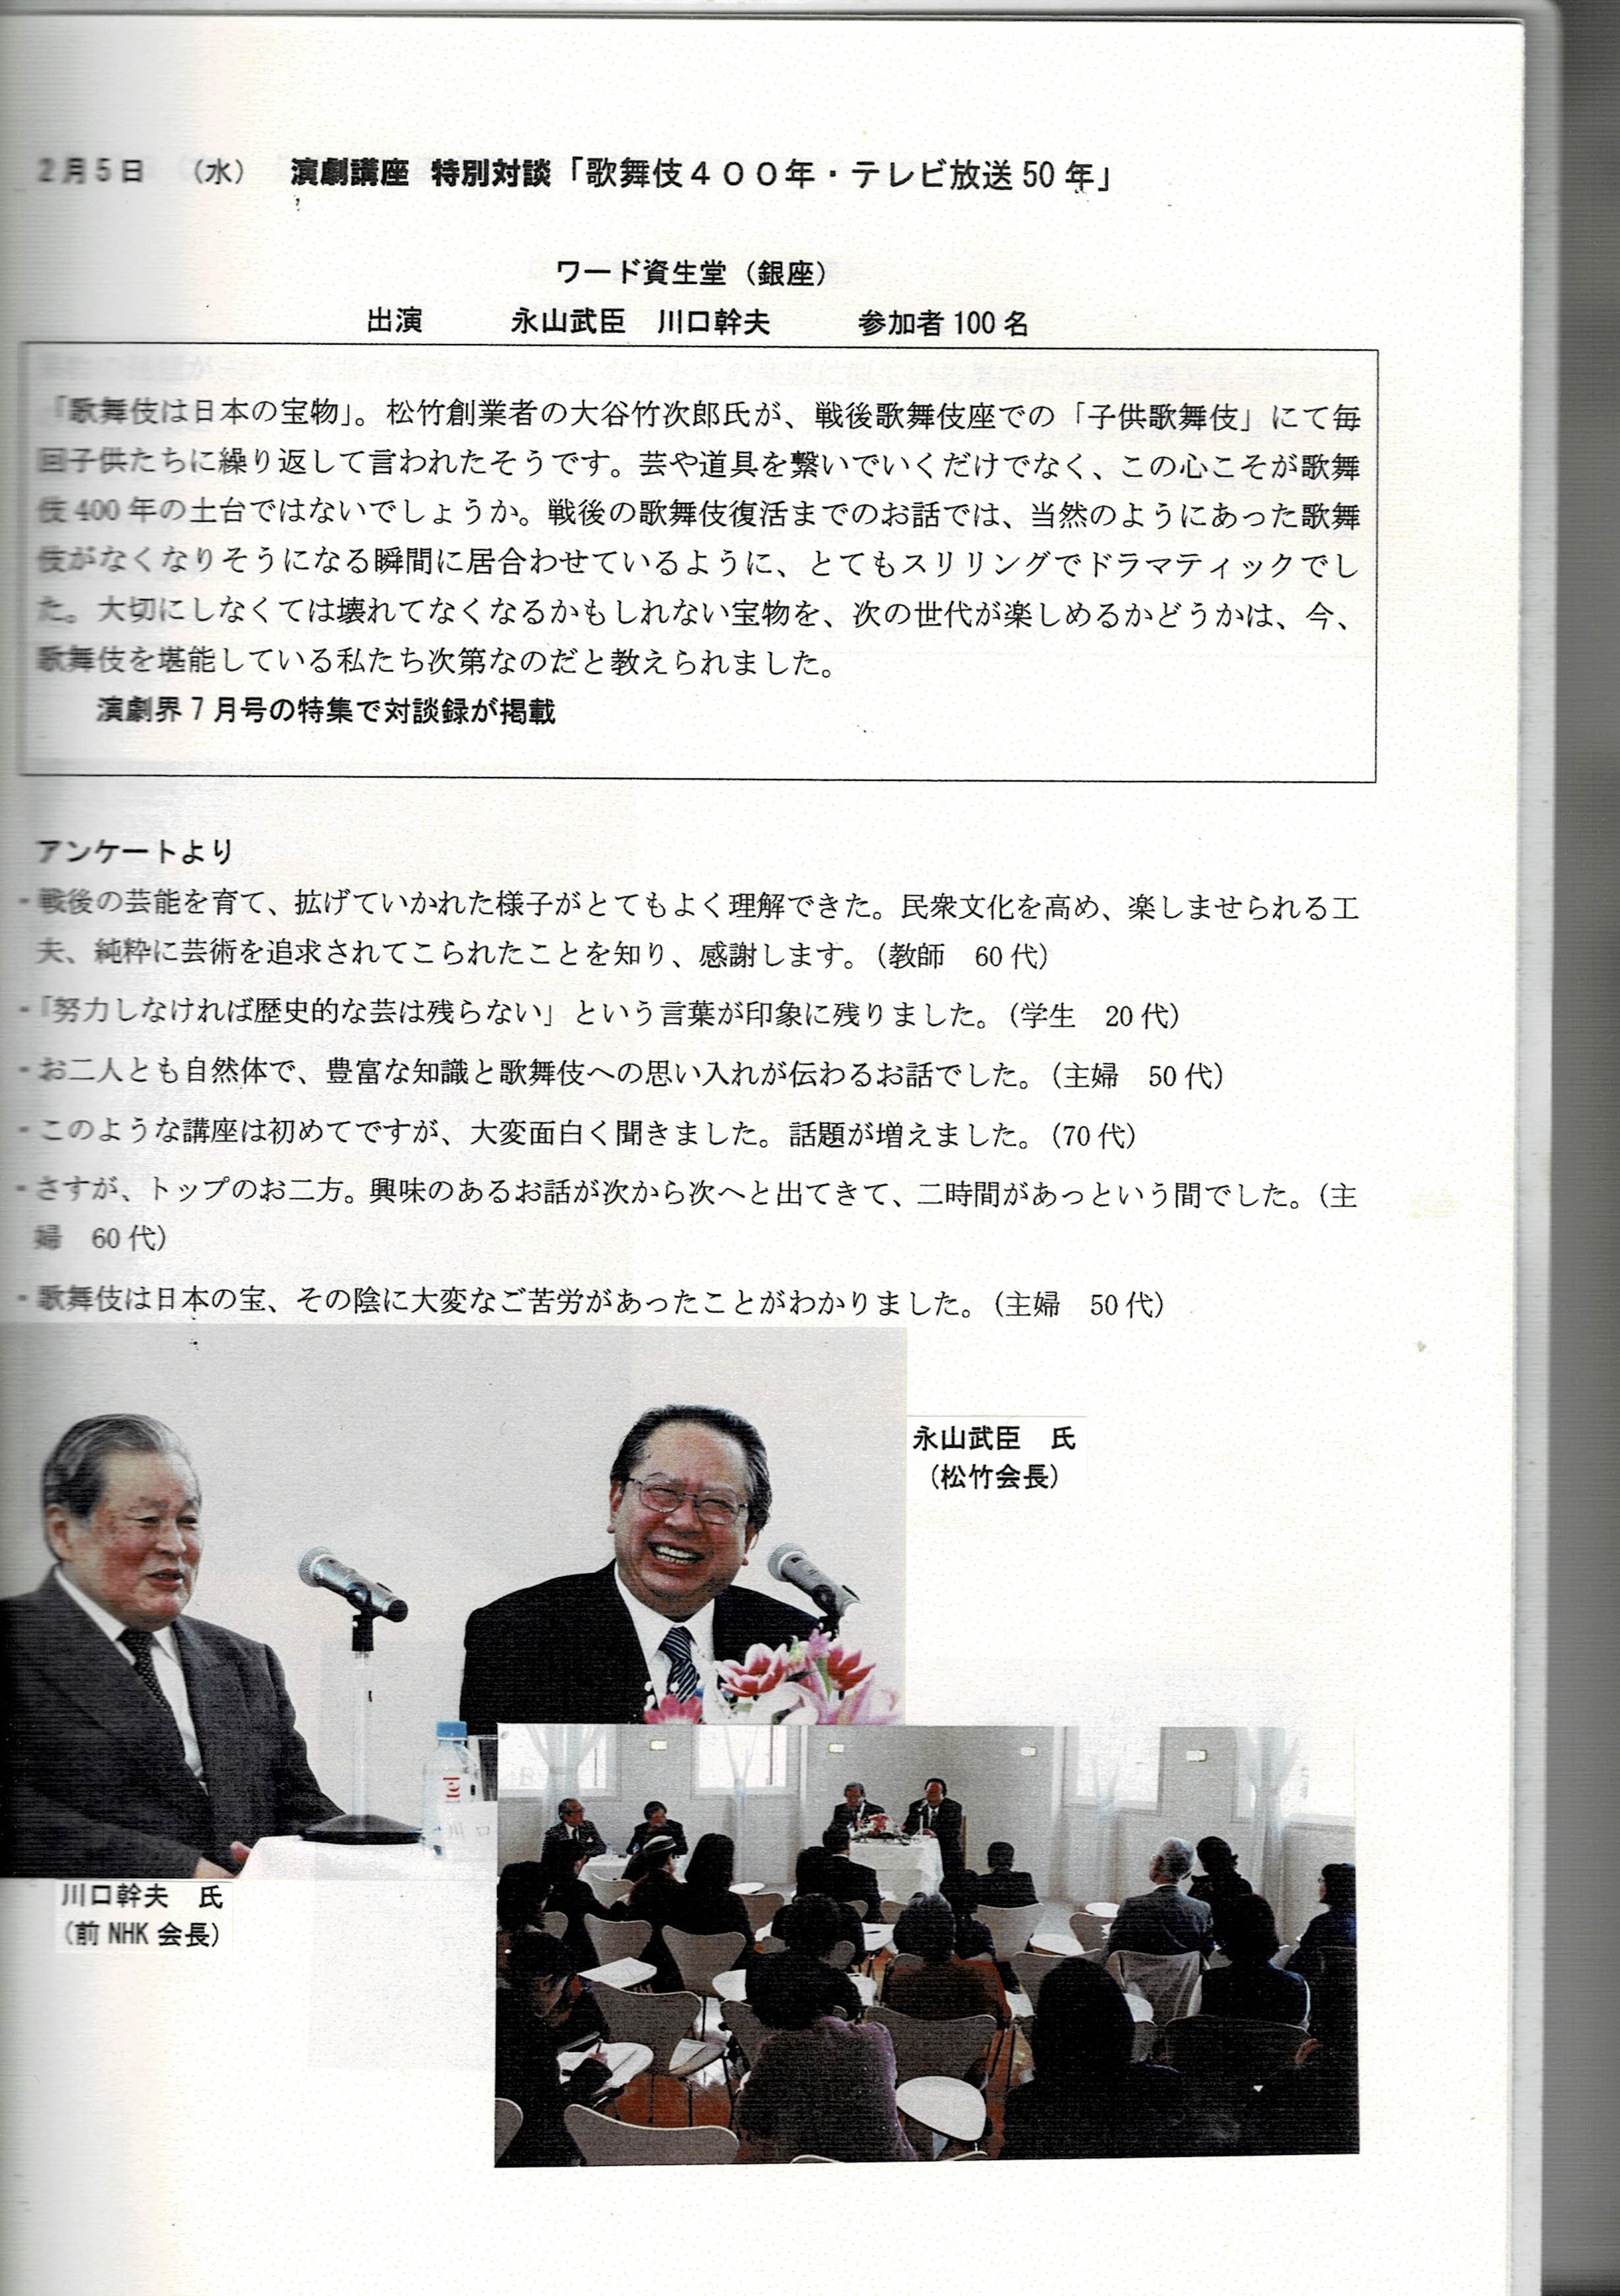 2003_川口、永山対談_ワード資生堂_2